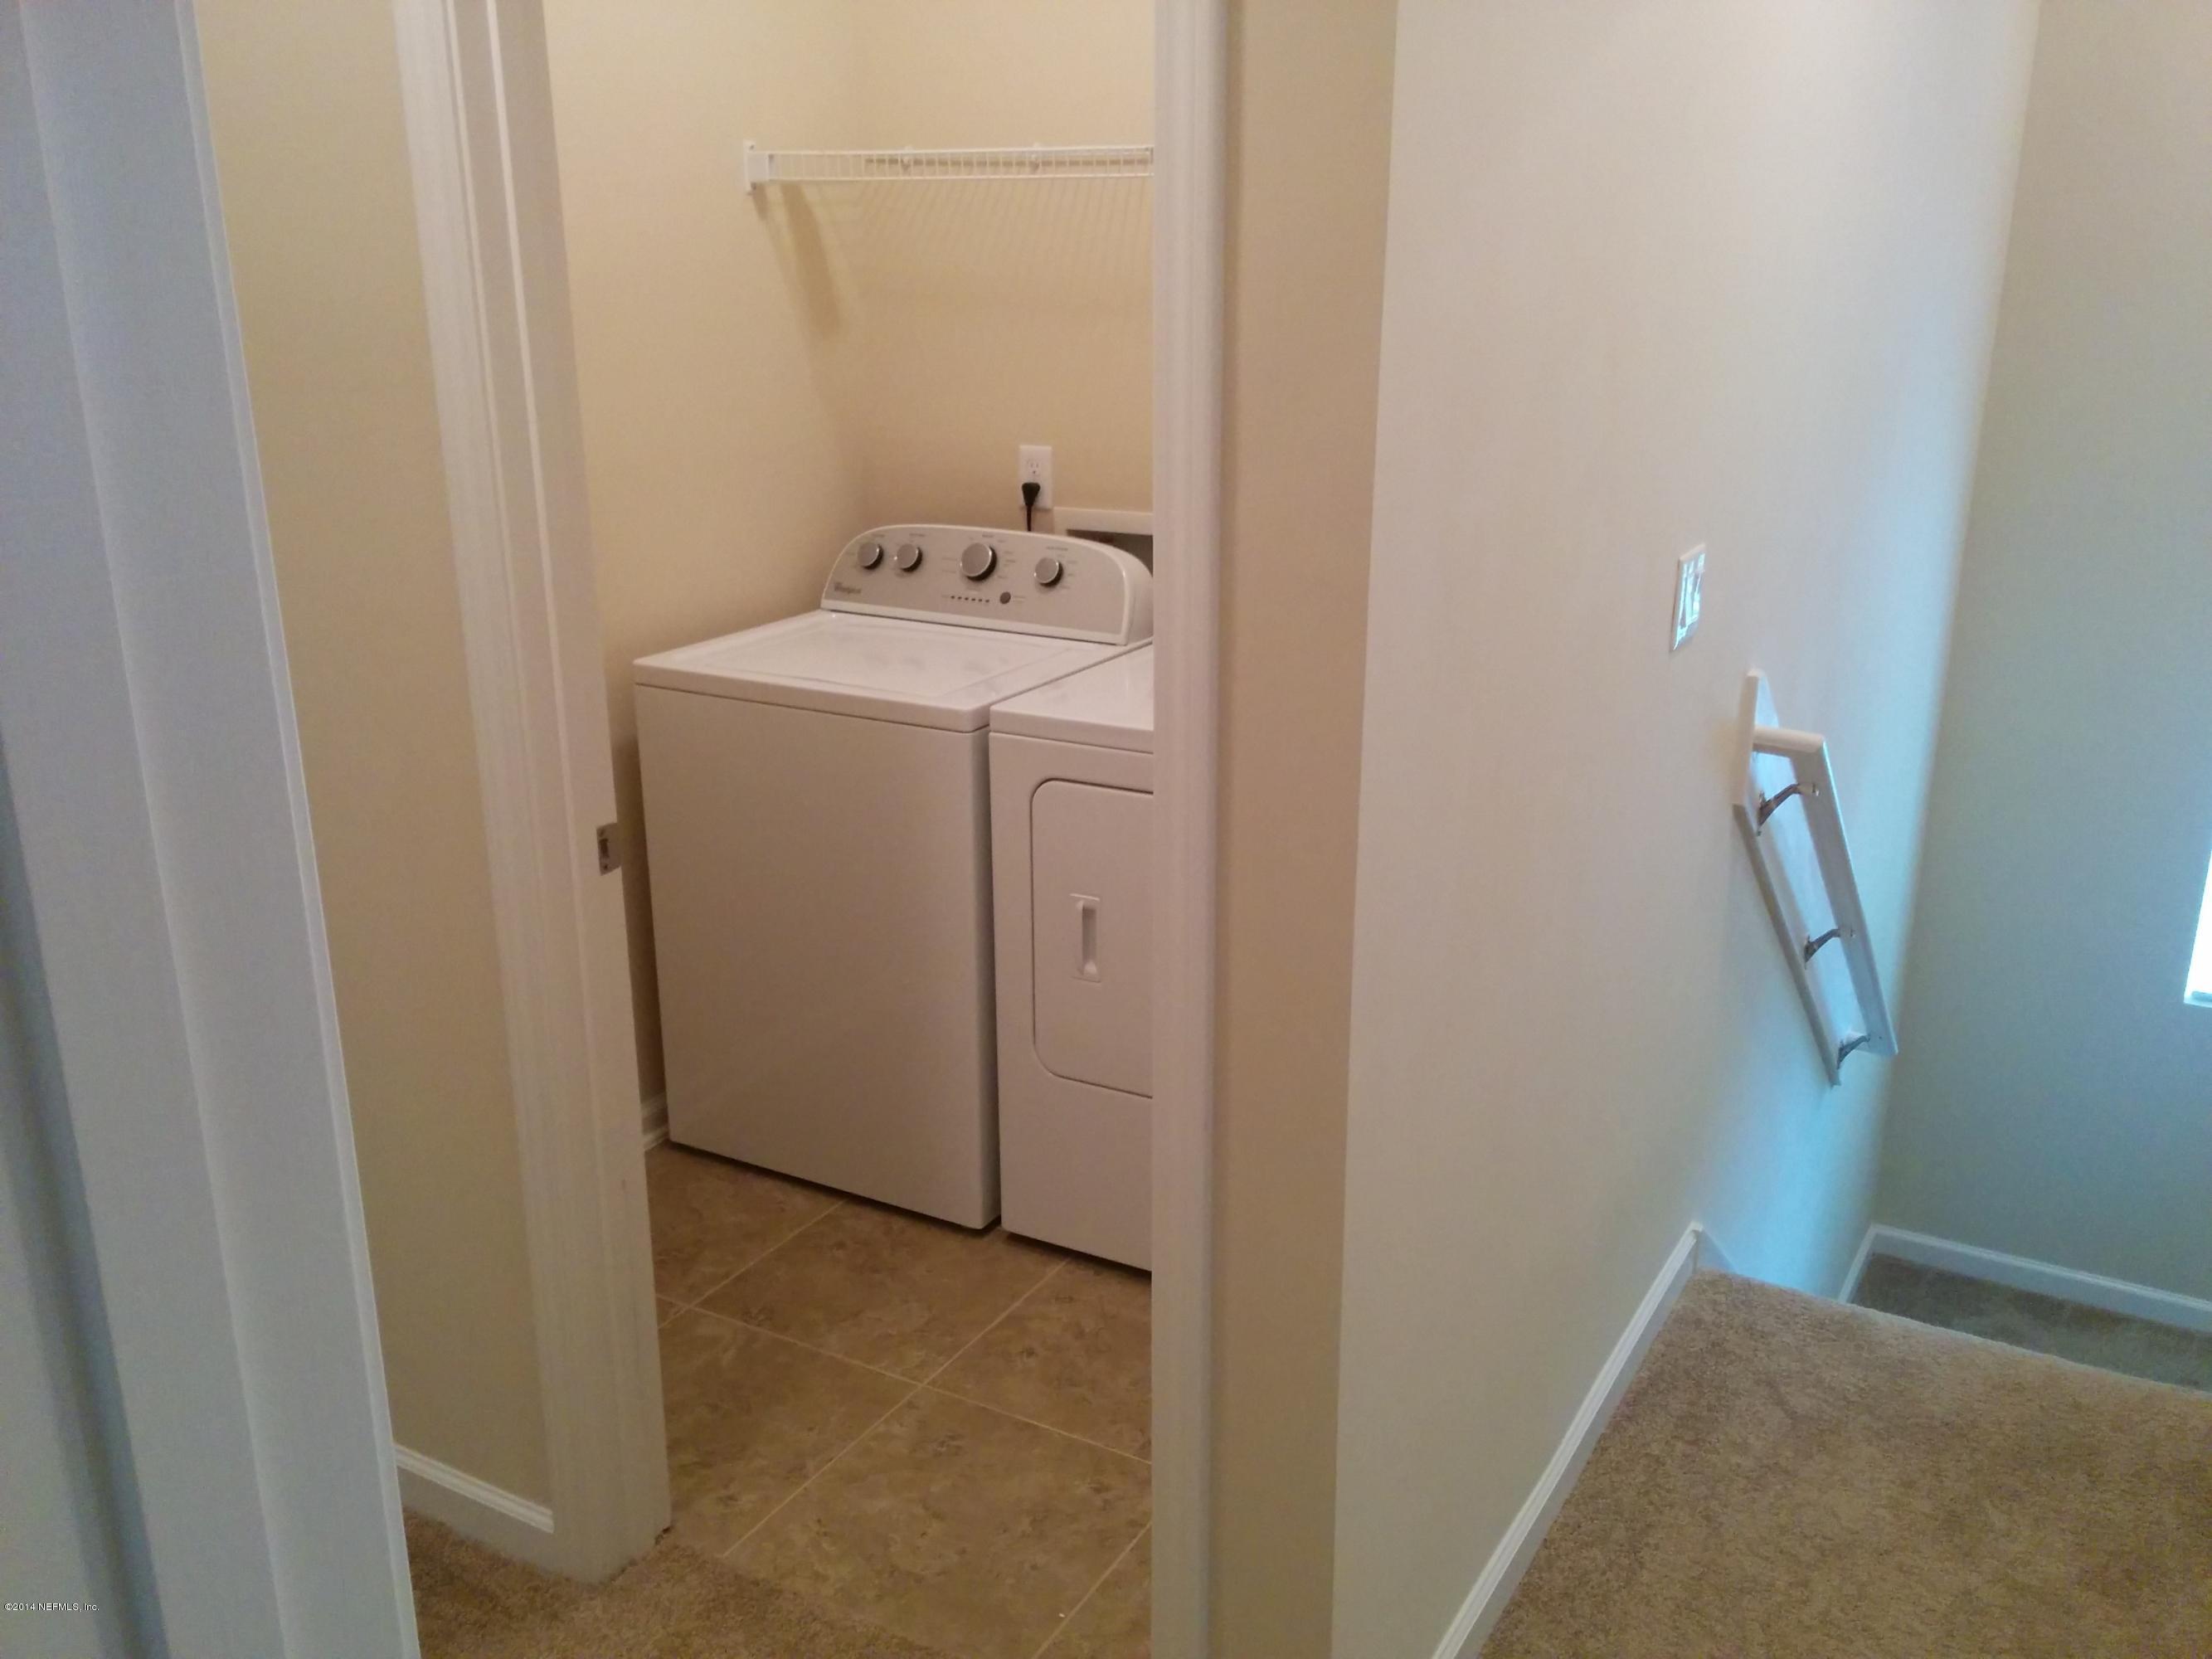 22 FERNBROOK,ST JOHNS,FLORIDA 32259,3 Bedrooms Bedrooms,2 BathroomsBathrooms,Residential - single family,FERNBROOK,854323